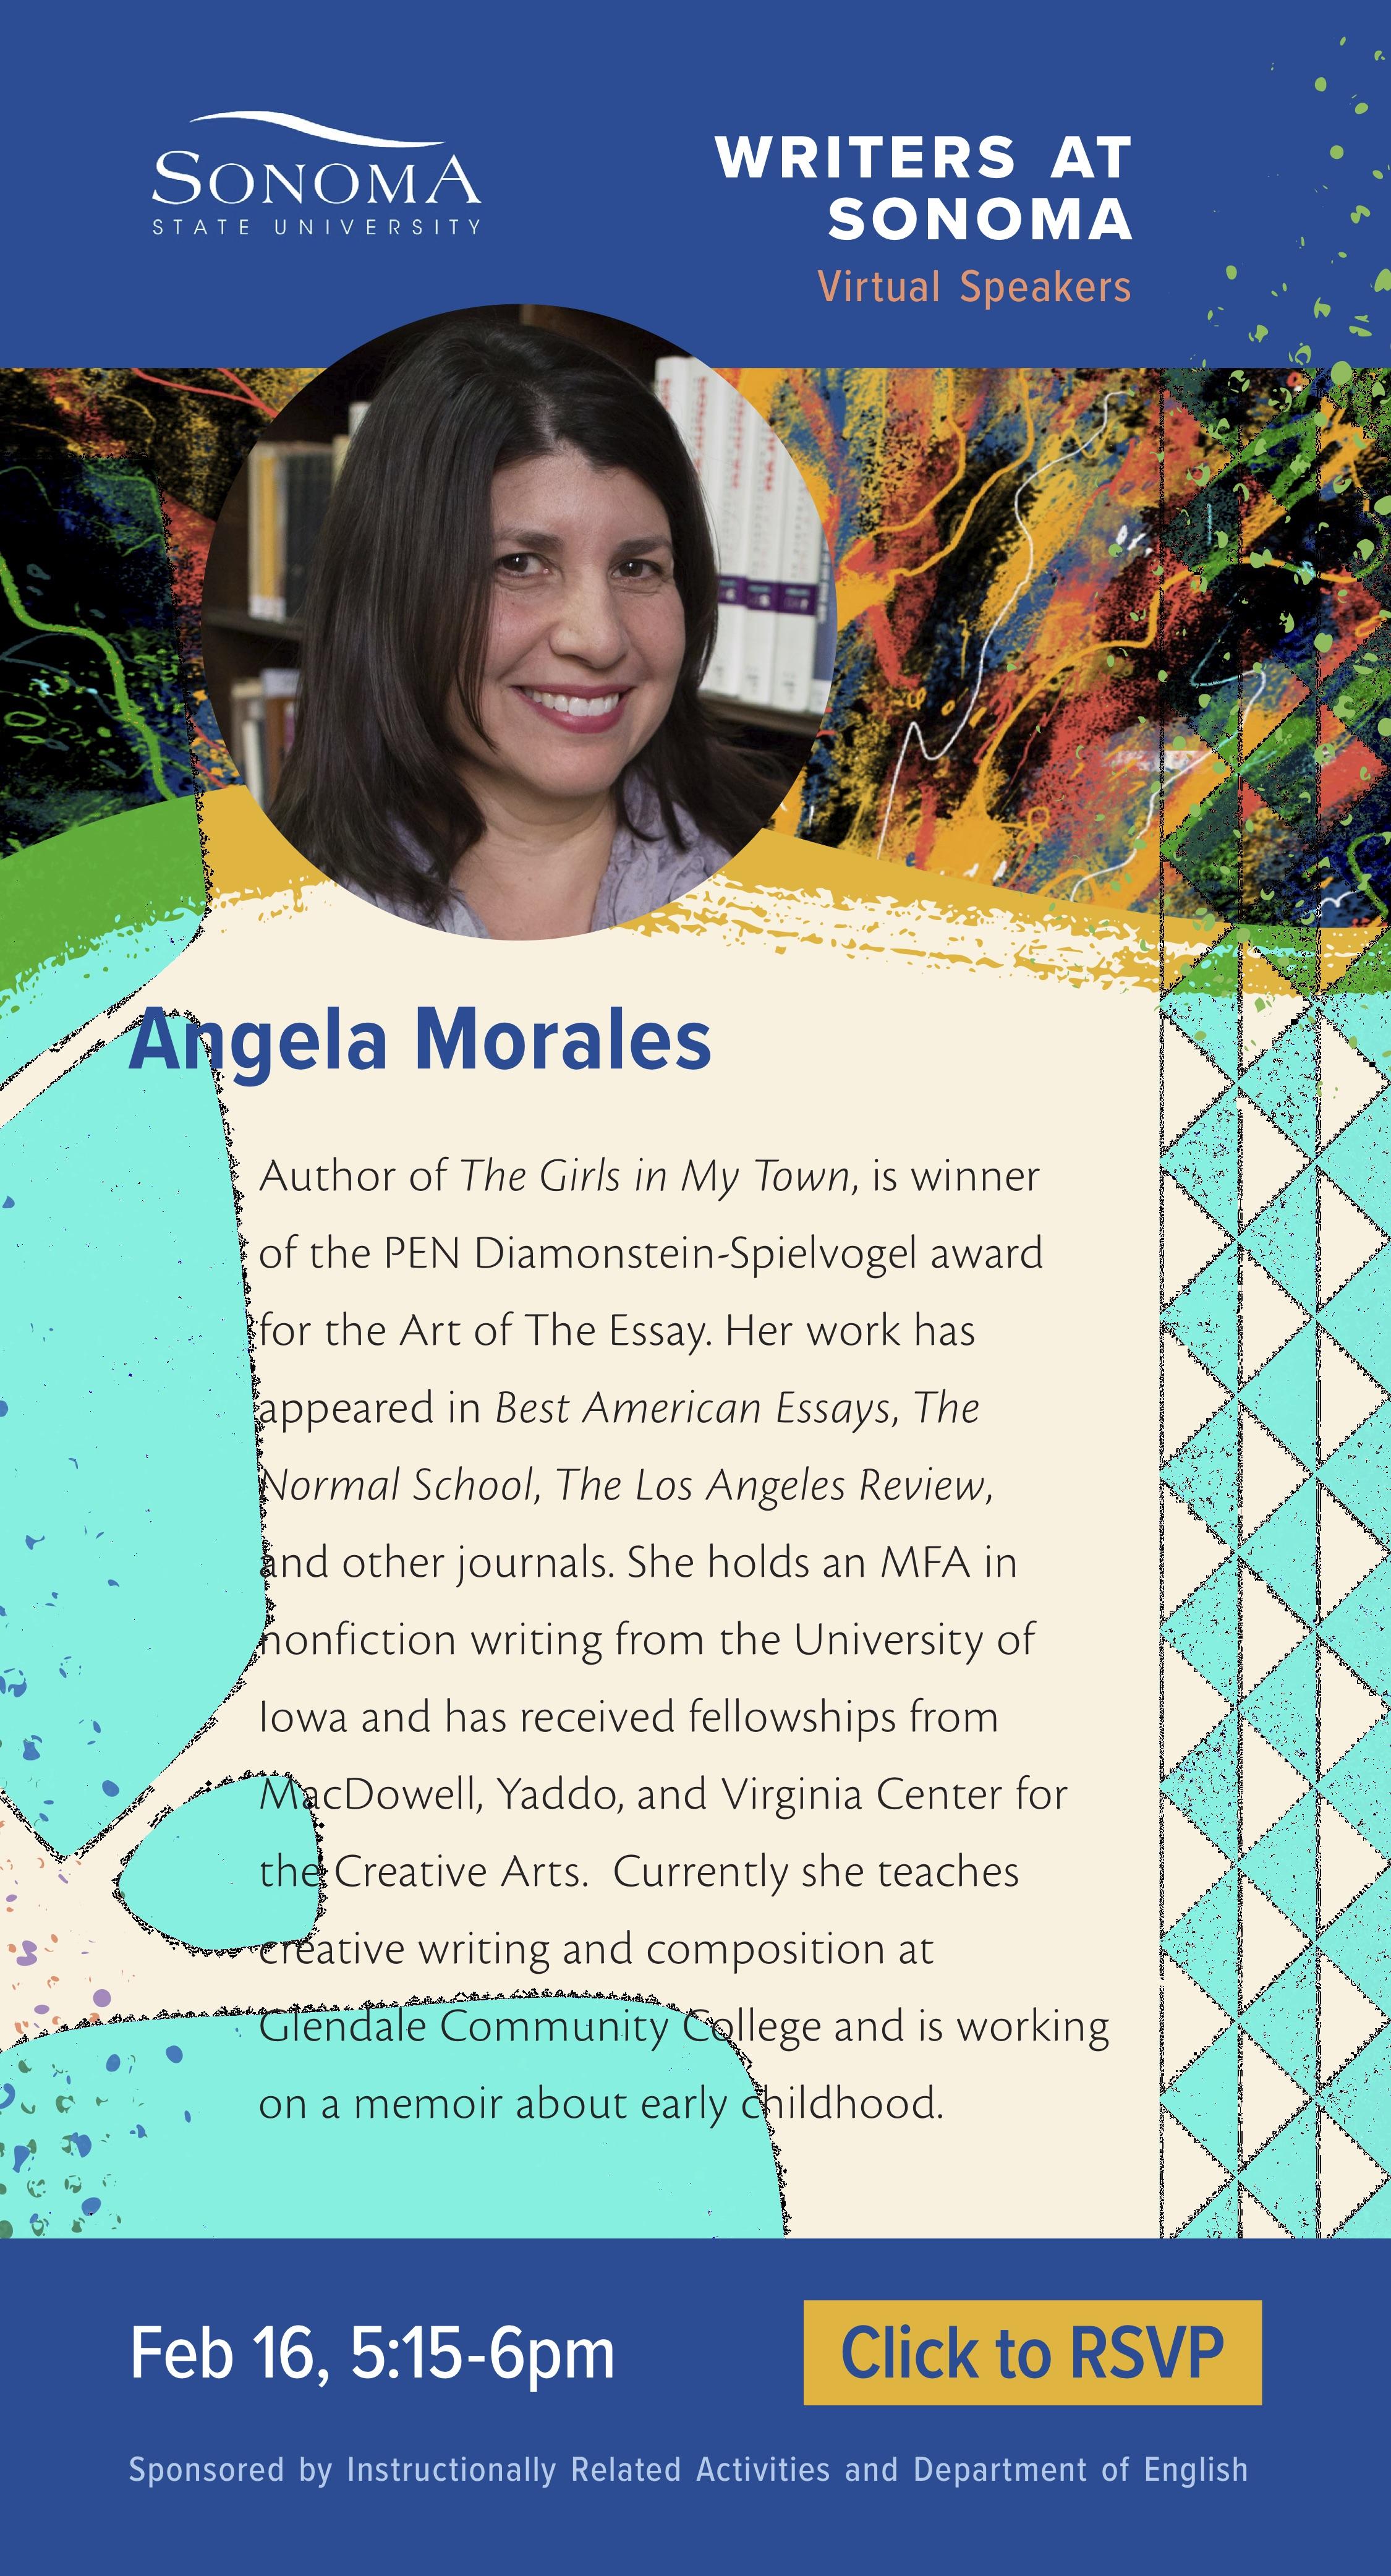 Angela Morales Writers at Sonoma Virtual Speaker